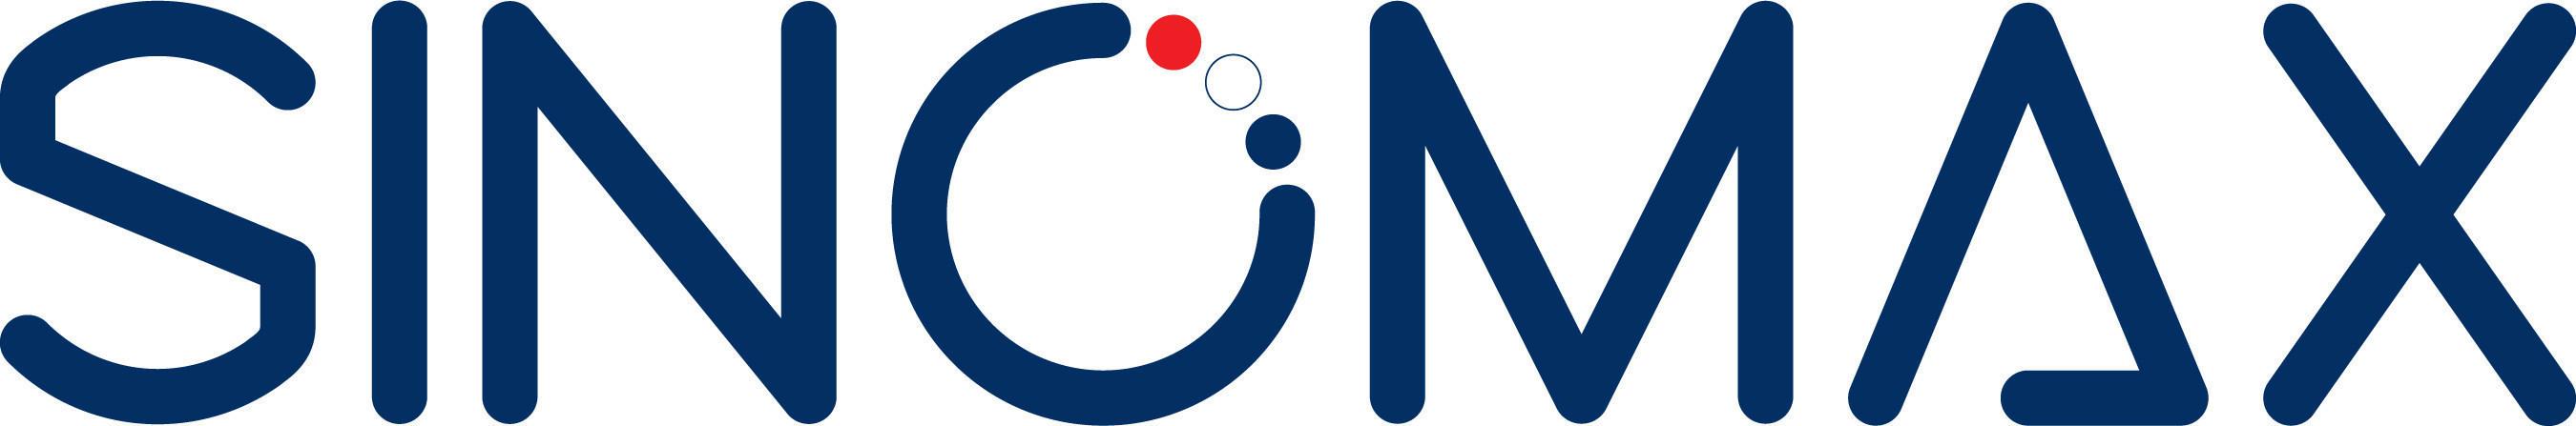 Sinomax USA Logo